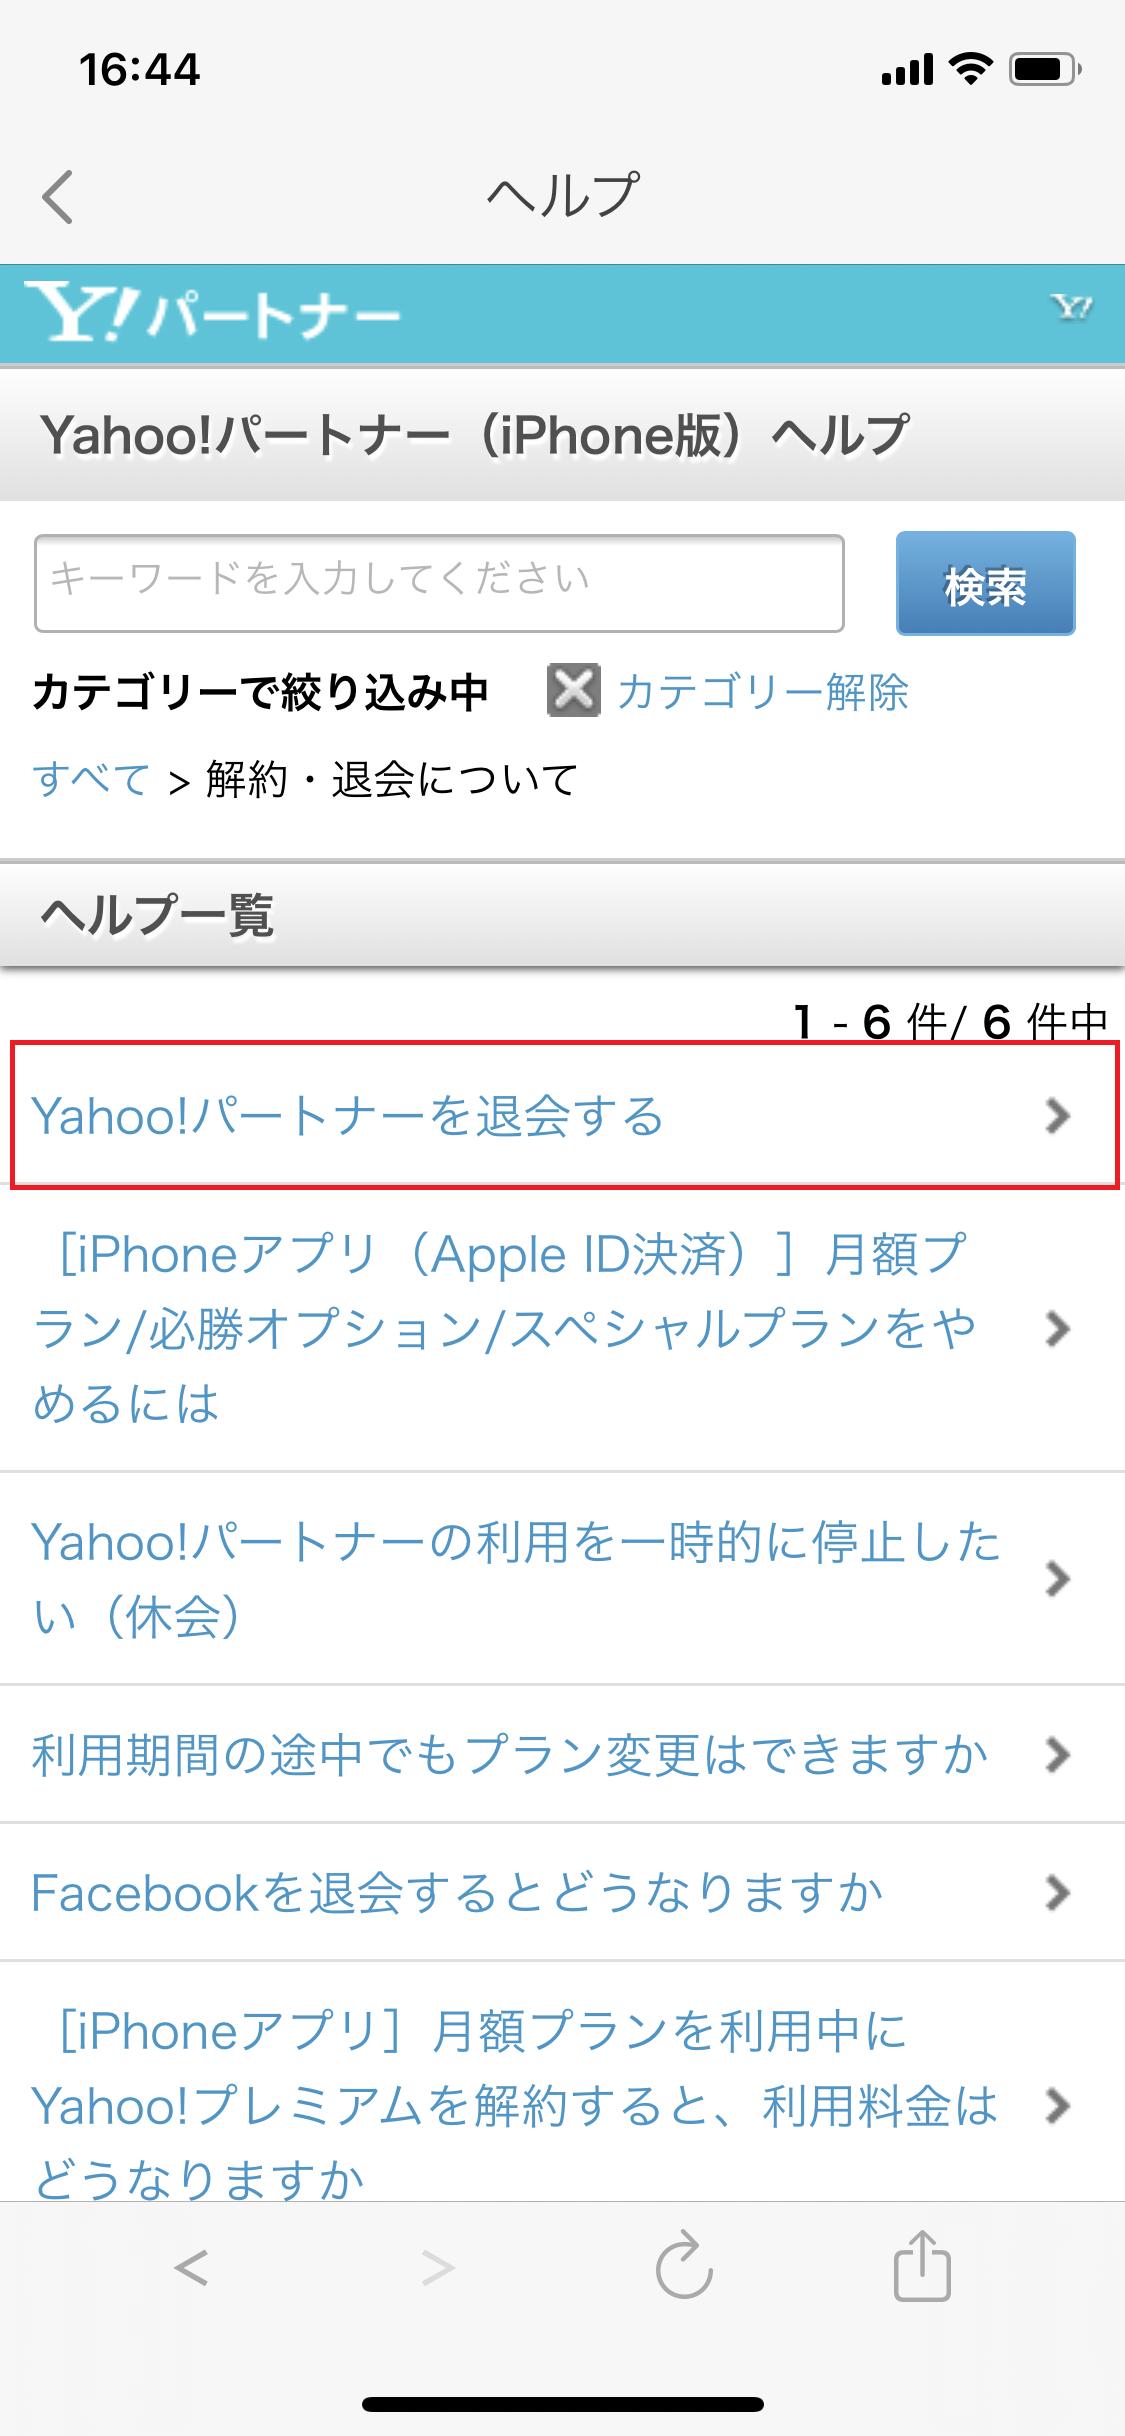 Yahoo!パートナー 最上部にある「Yahoo!パートナーを退会する」をタップ